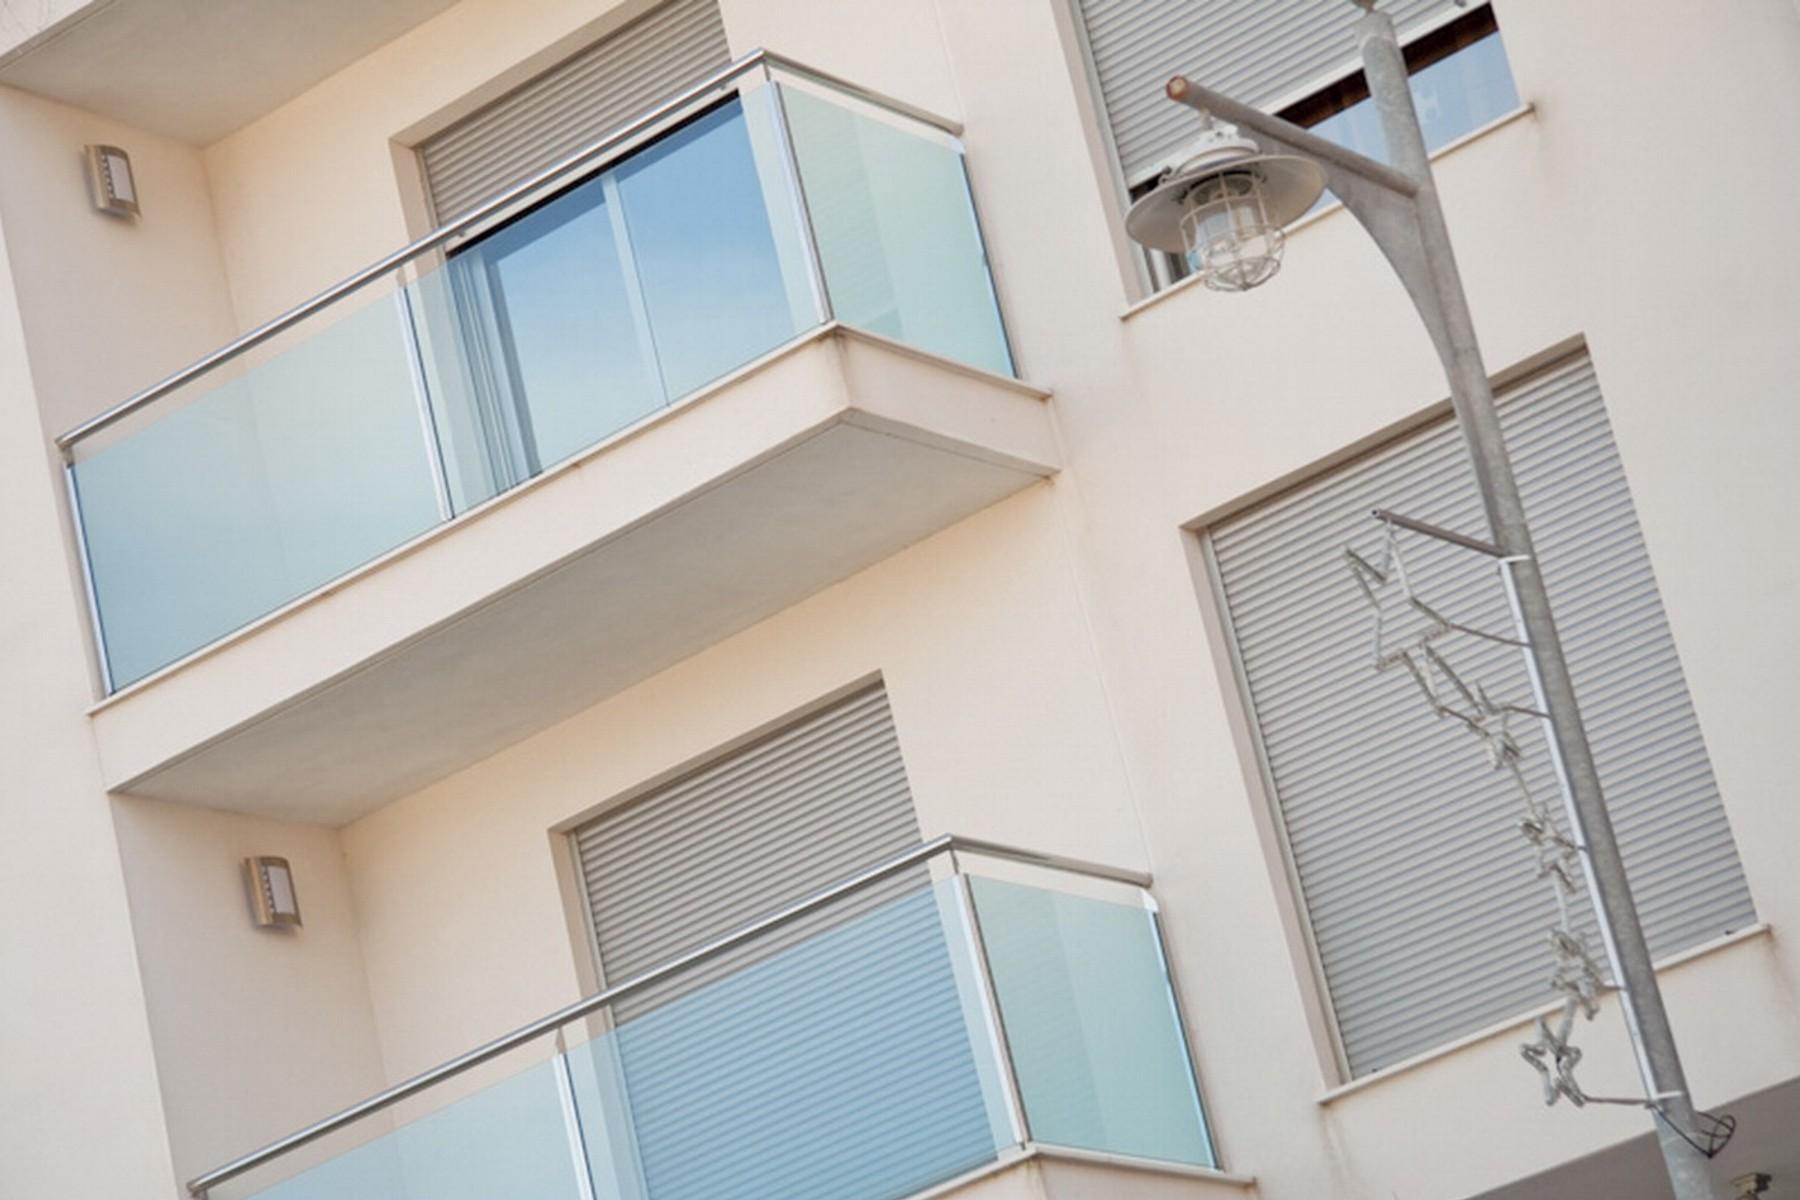 Imaginarq-042-edificio-viviendas.-Pego.-Alicante.05A